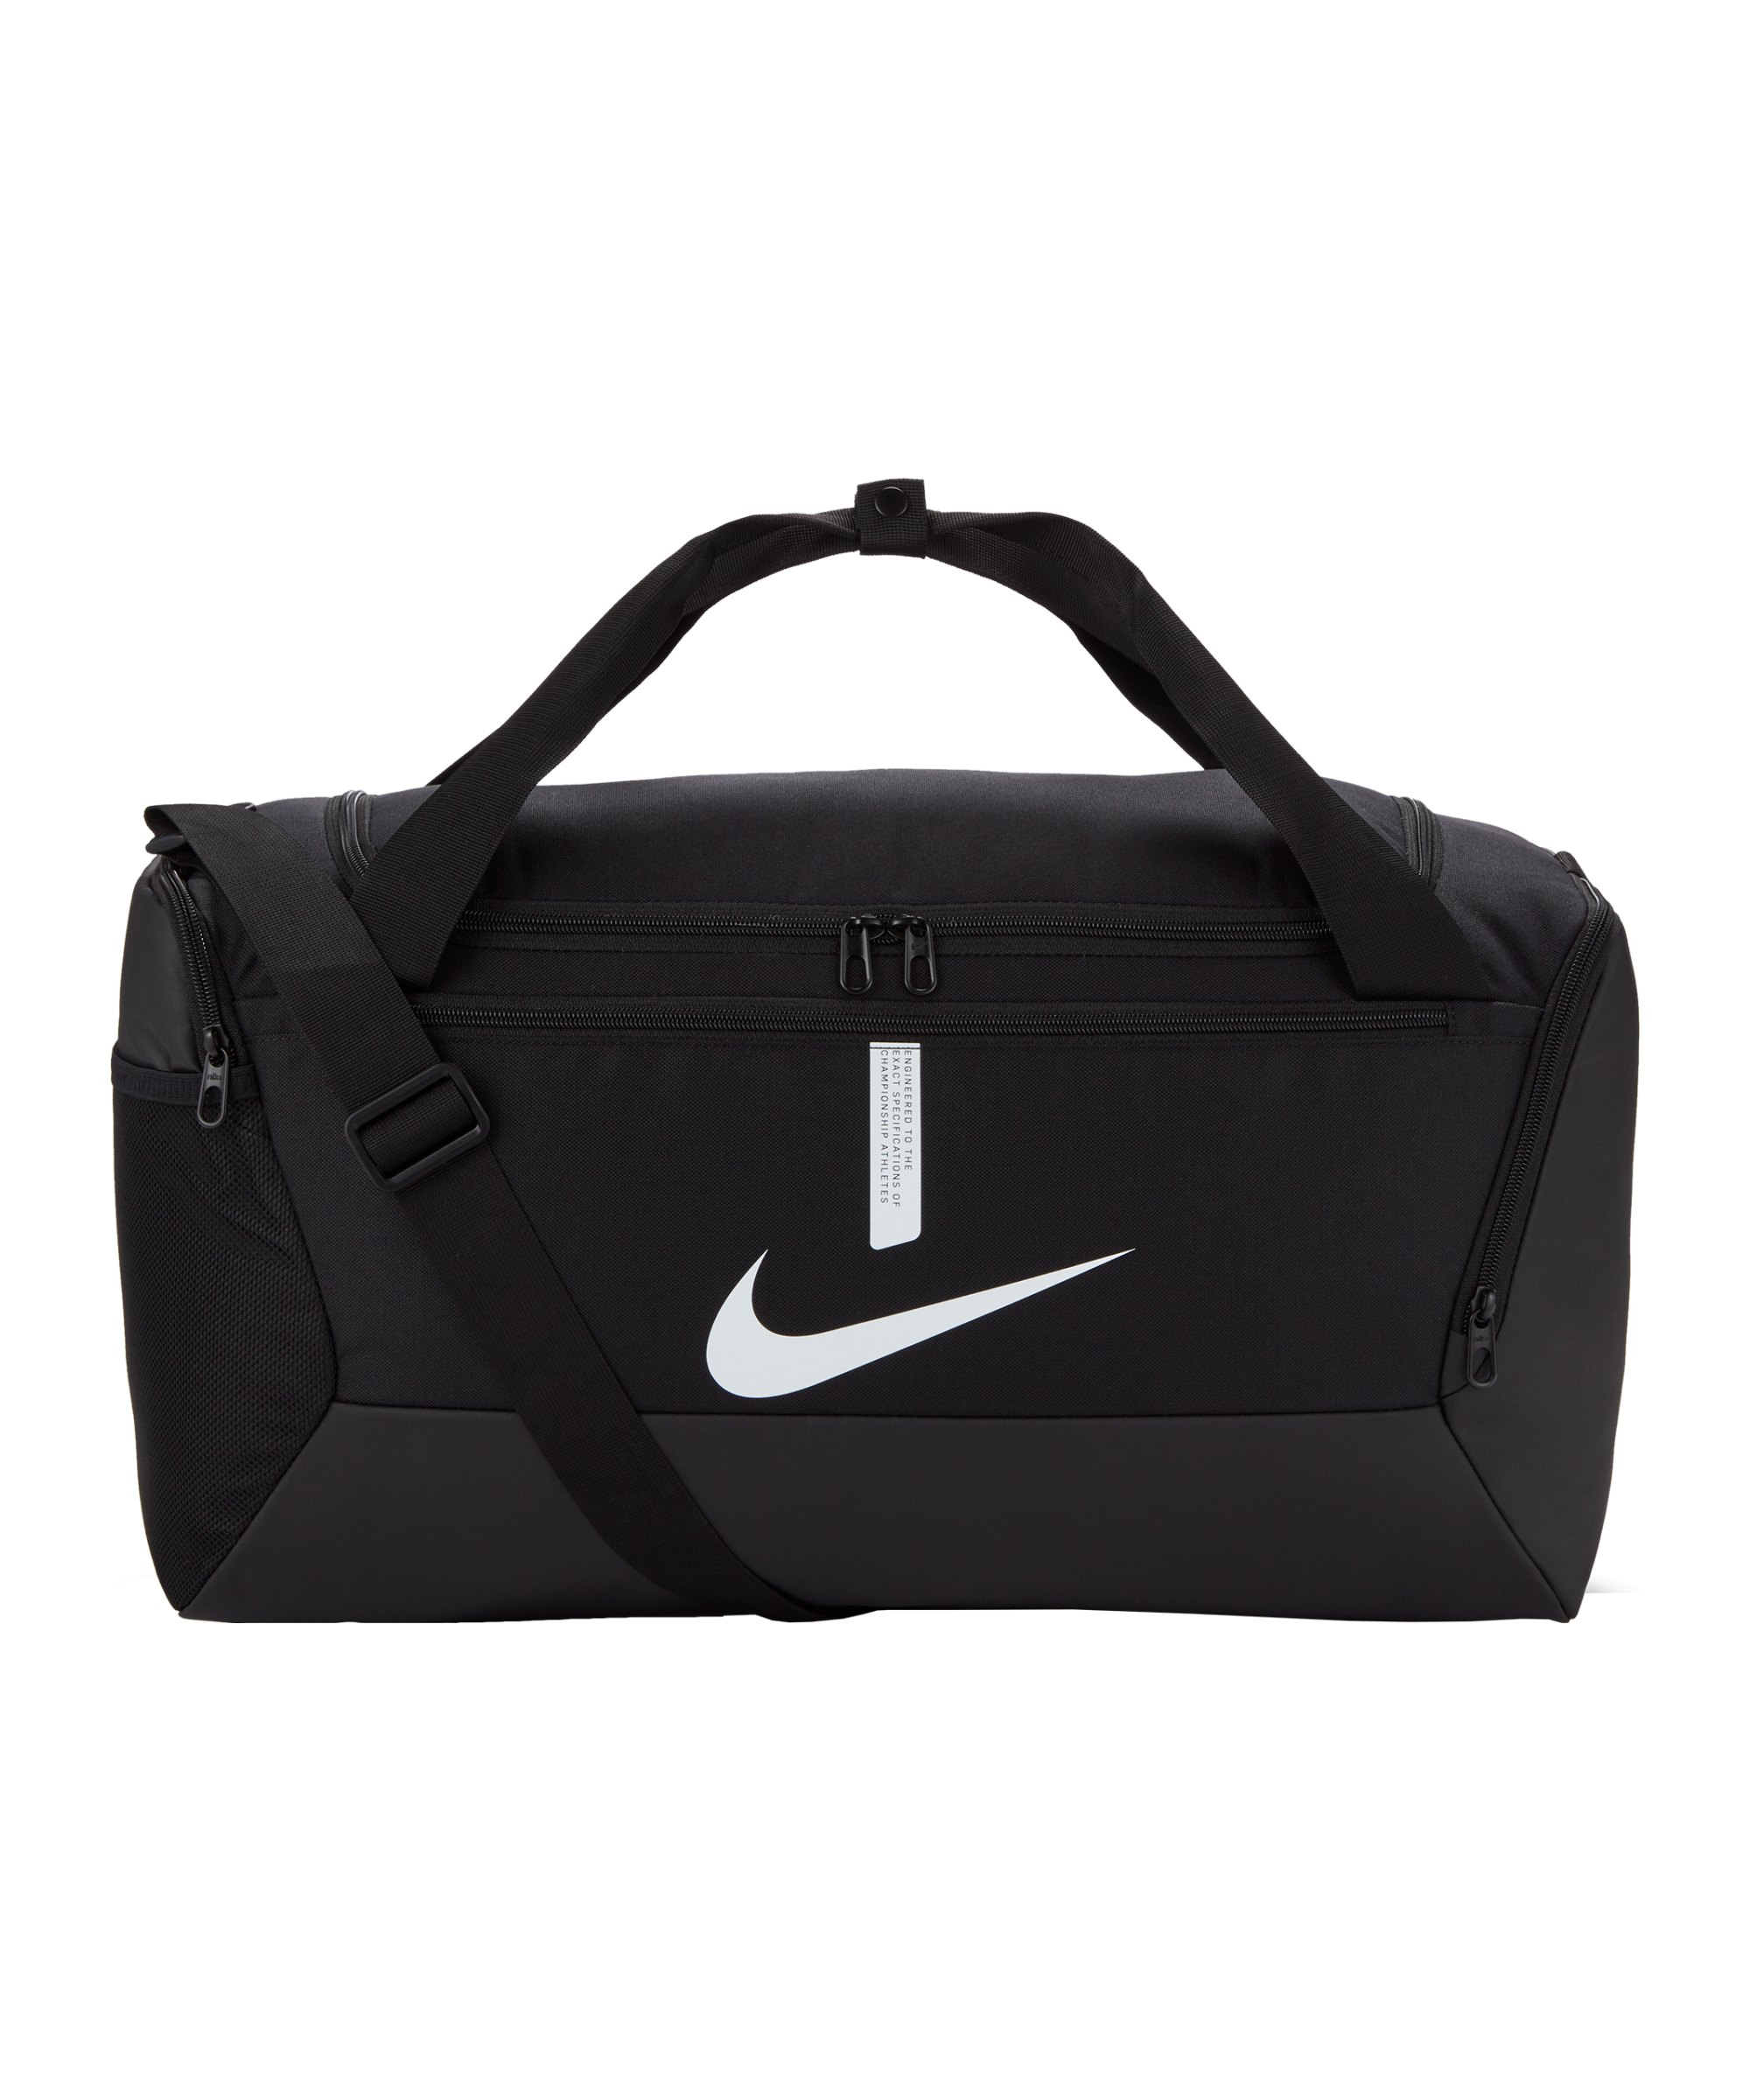 Nike Academy Team Duffel Tasche Small Schwarz F010 - schwarz